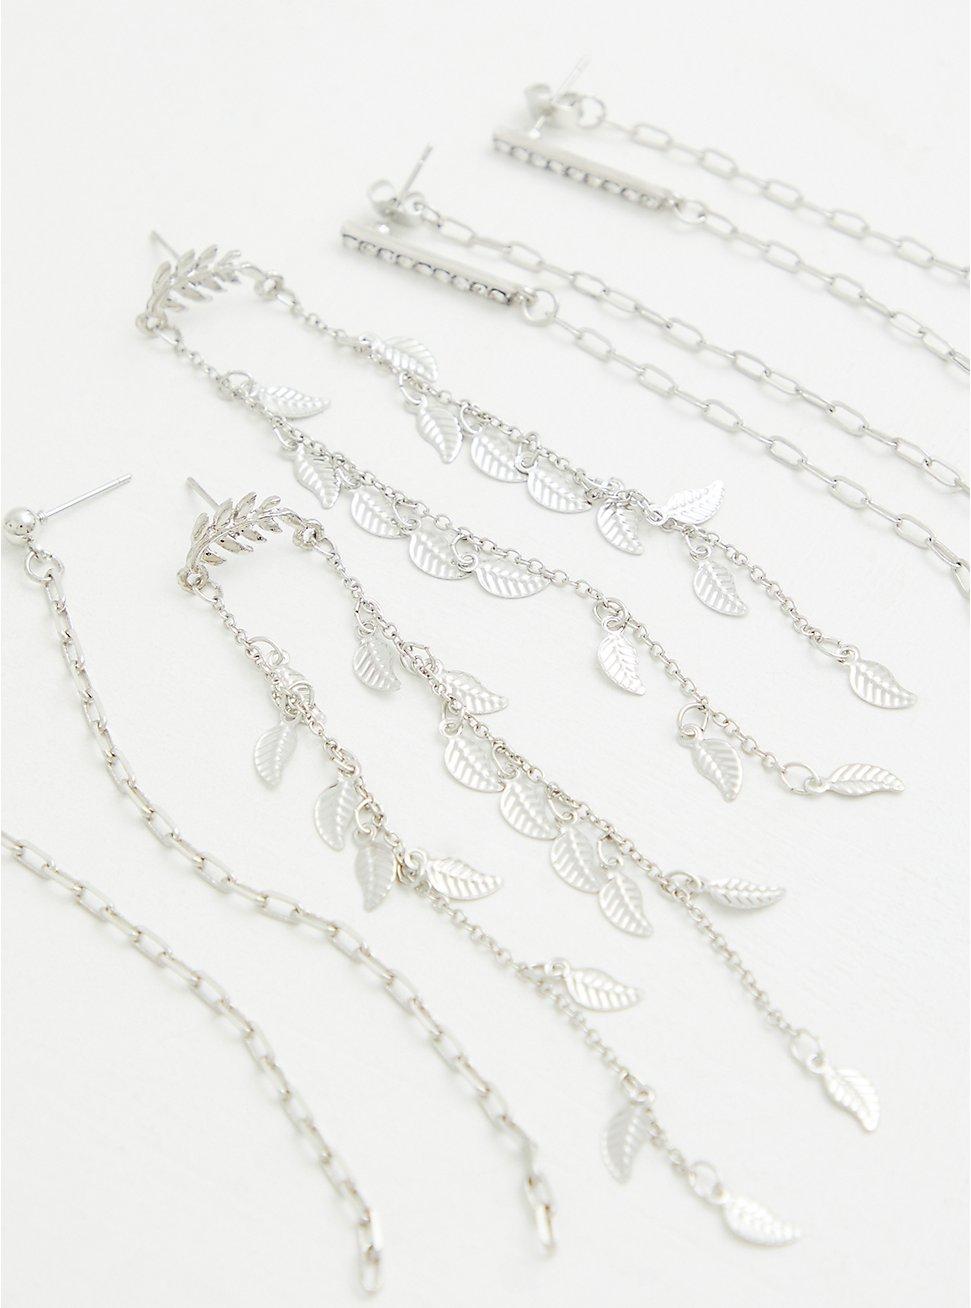 Silver-Tone Drop Earrings Set - Set of 3, , hi-res